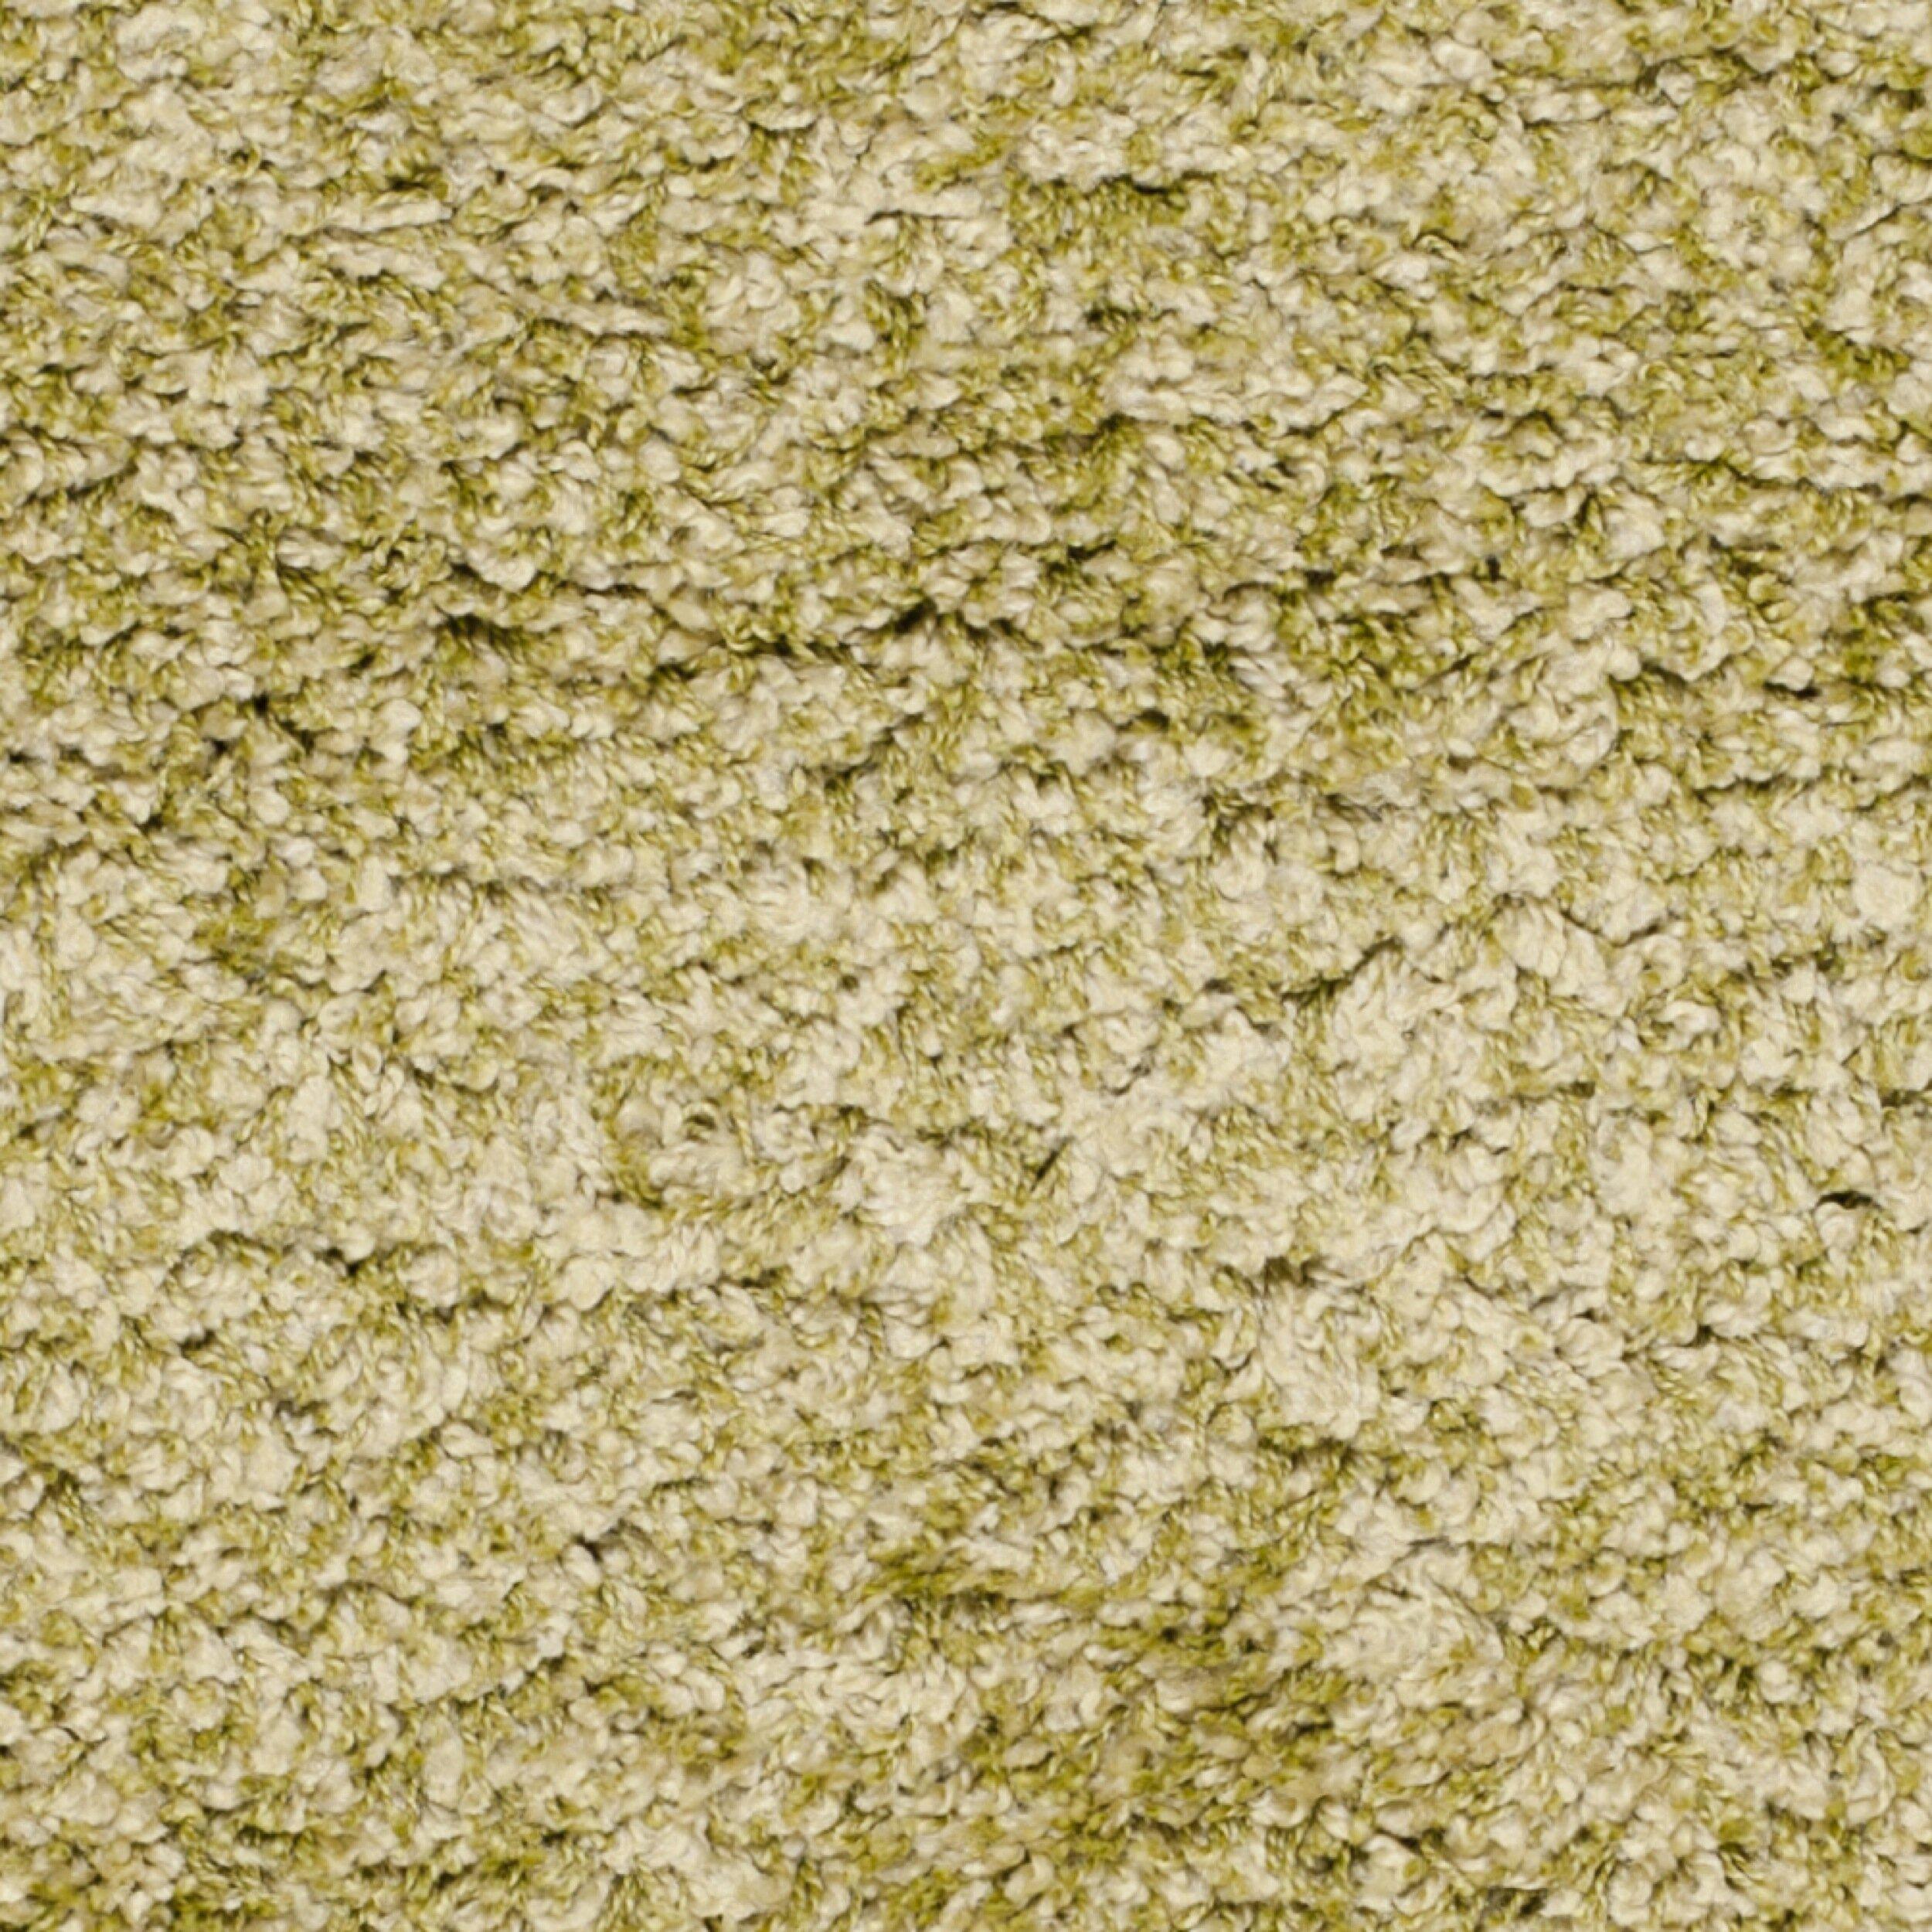 Green Rugs Next: Safavieh Green Shag Area Rug & Reviews